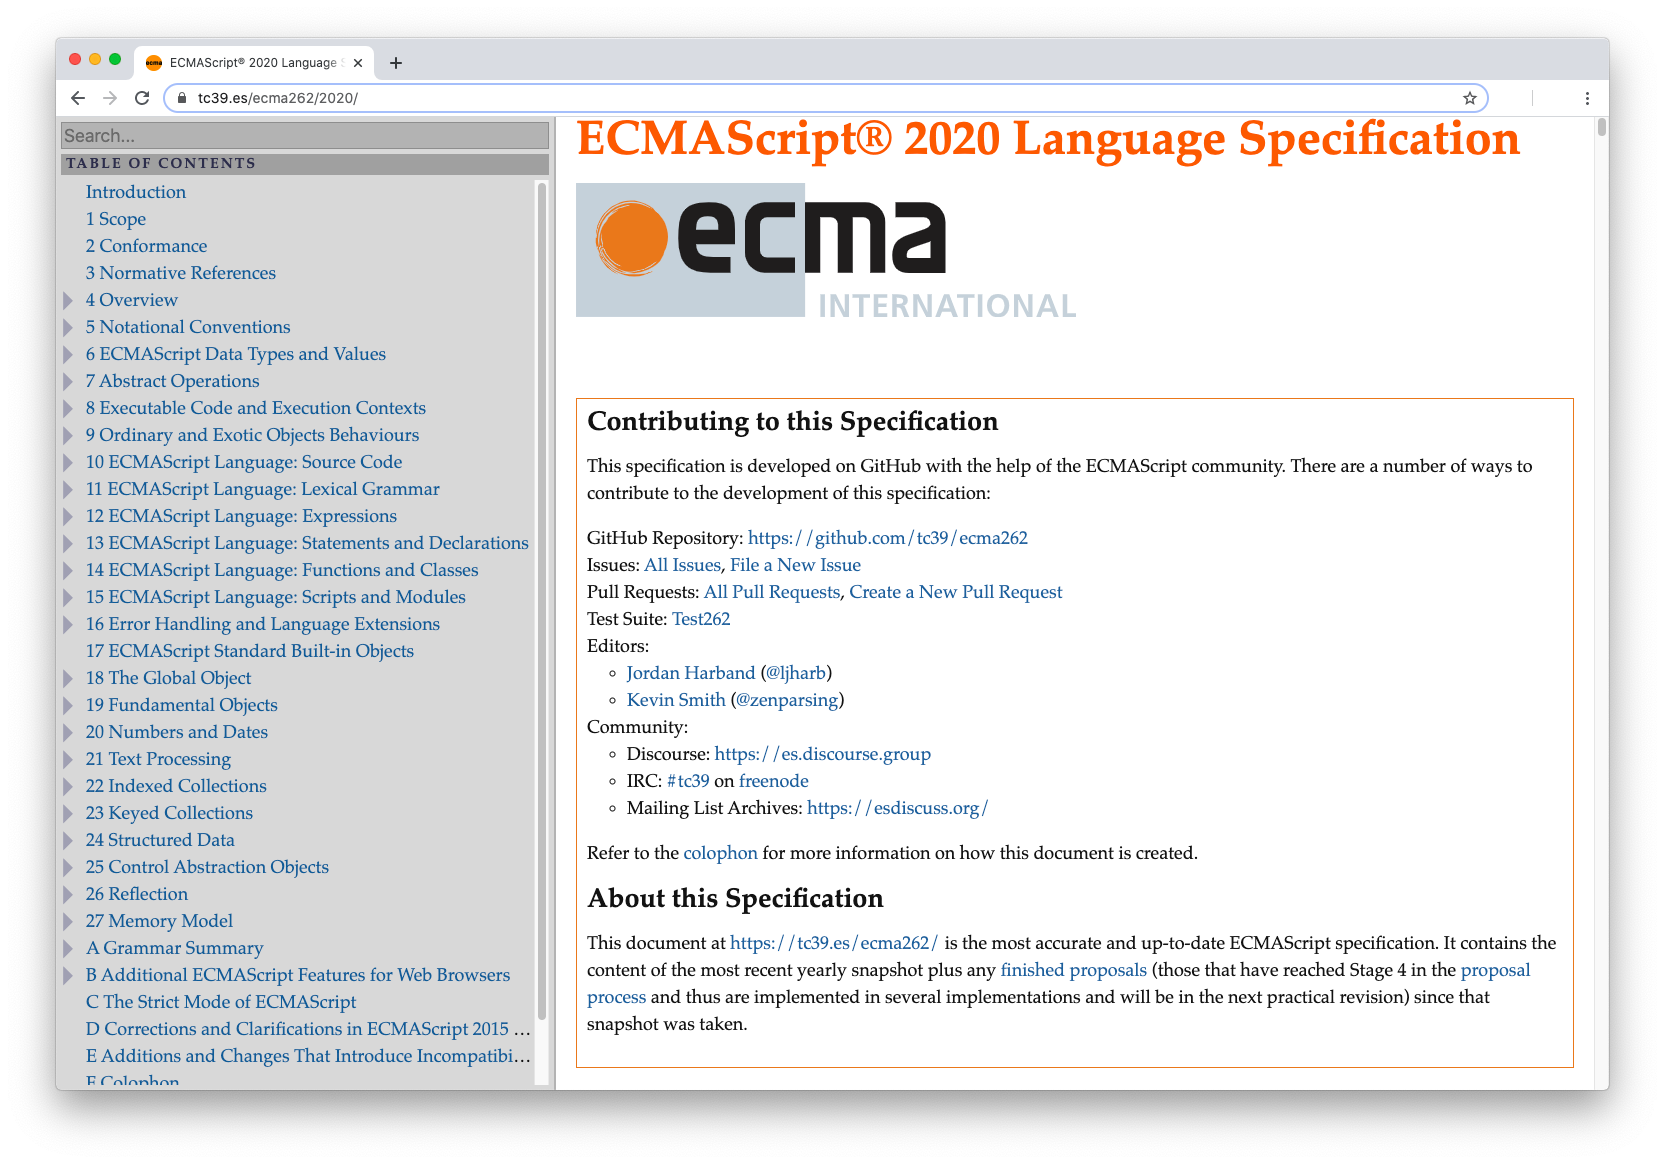 ES2020 Language Specification